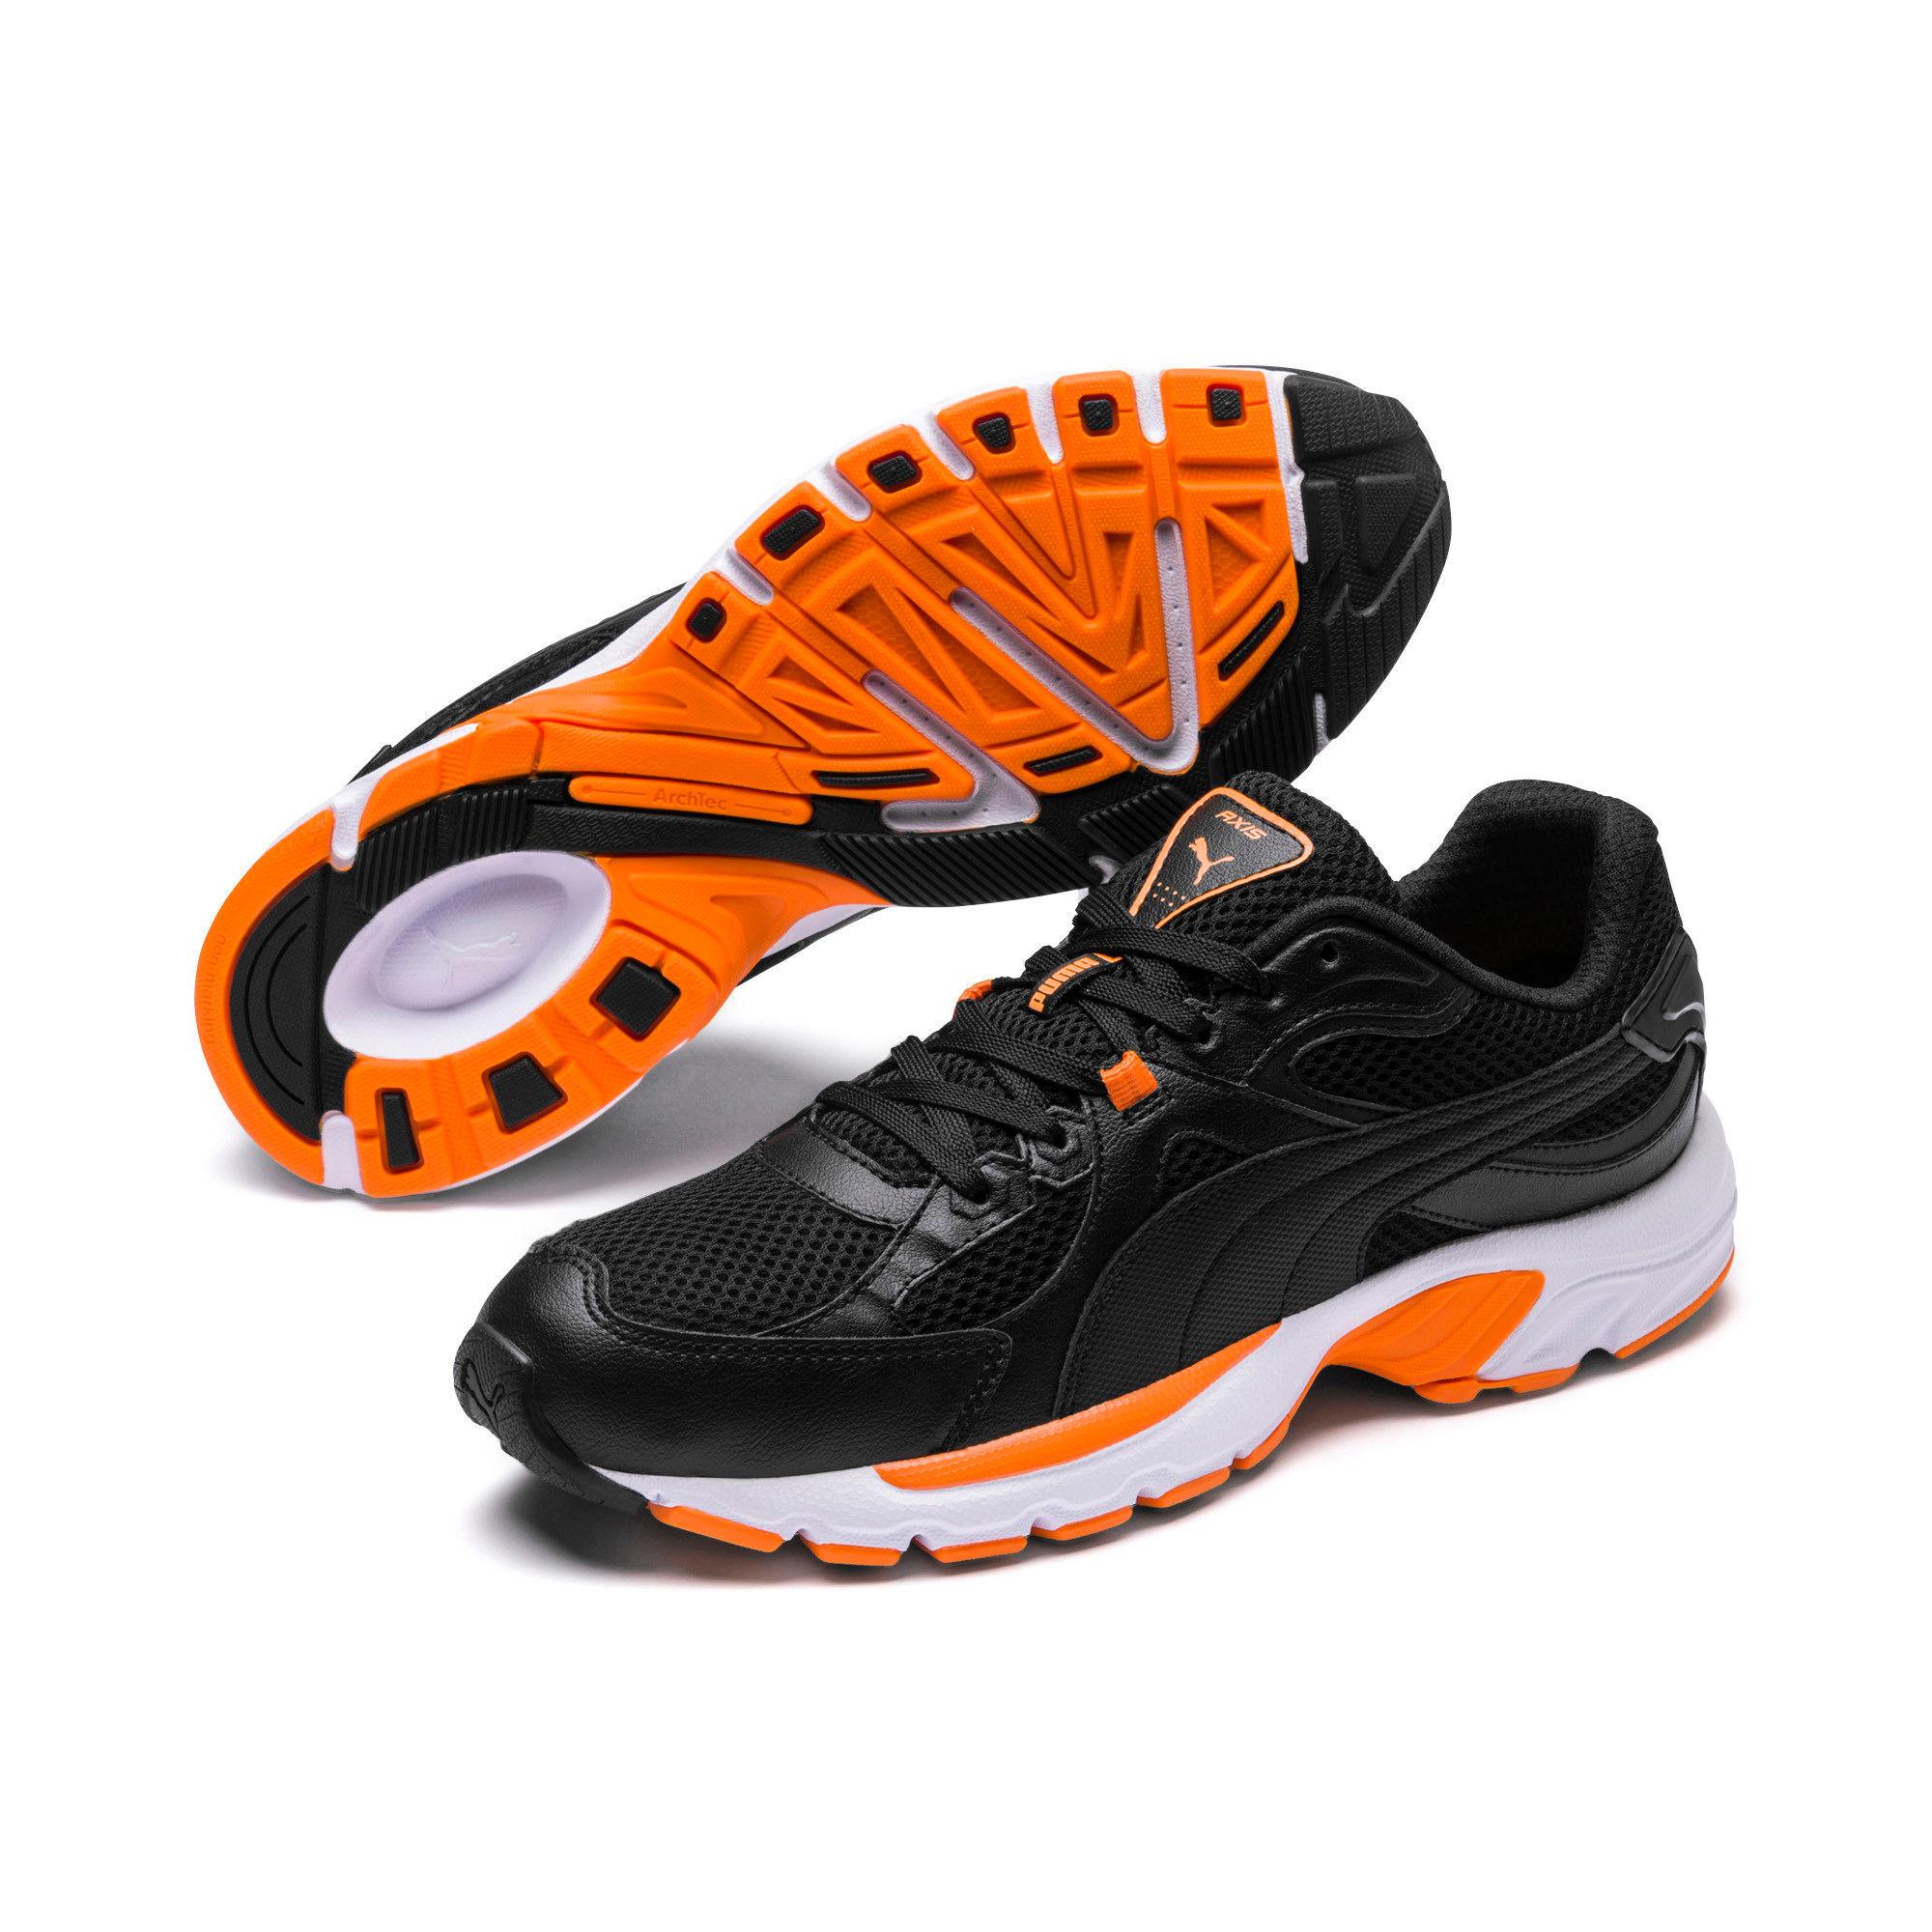 aluminio virtual enero  Puma Axis Plus 90S Black- Black Running Shoe: Buy Puma Axis Plus 90S Black-  Black Running Shoe Online at Best Price in India | Nykaa